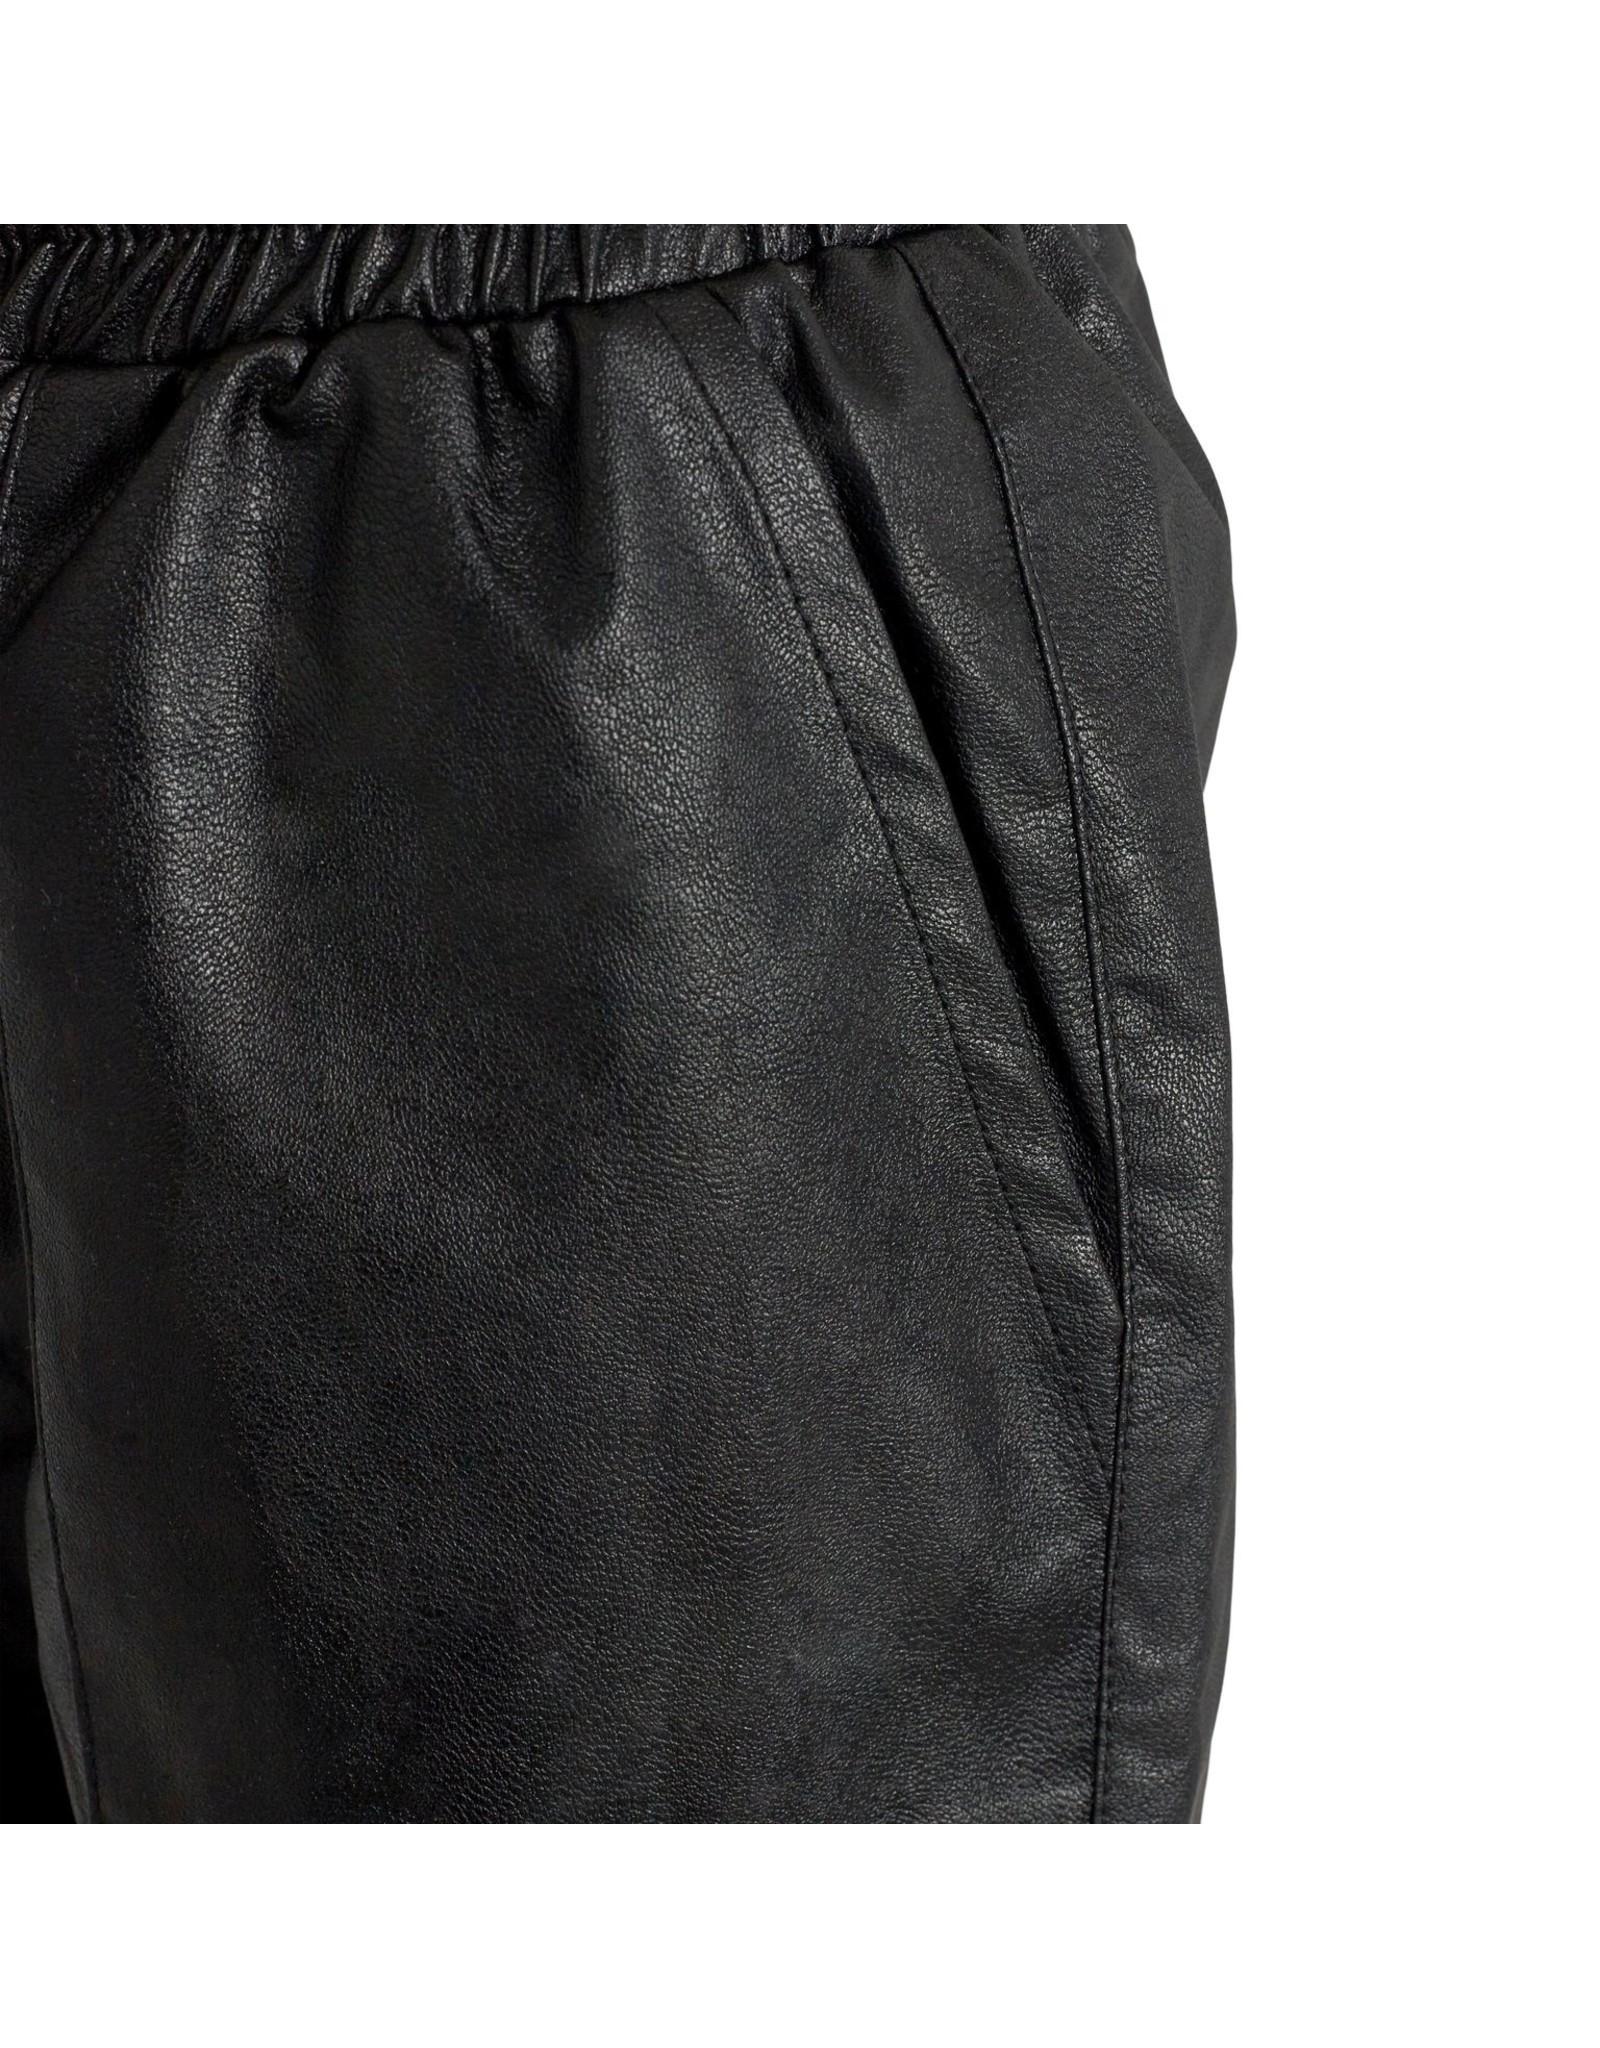 Petit by Sofie Schnoor Leather look pants